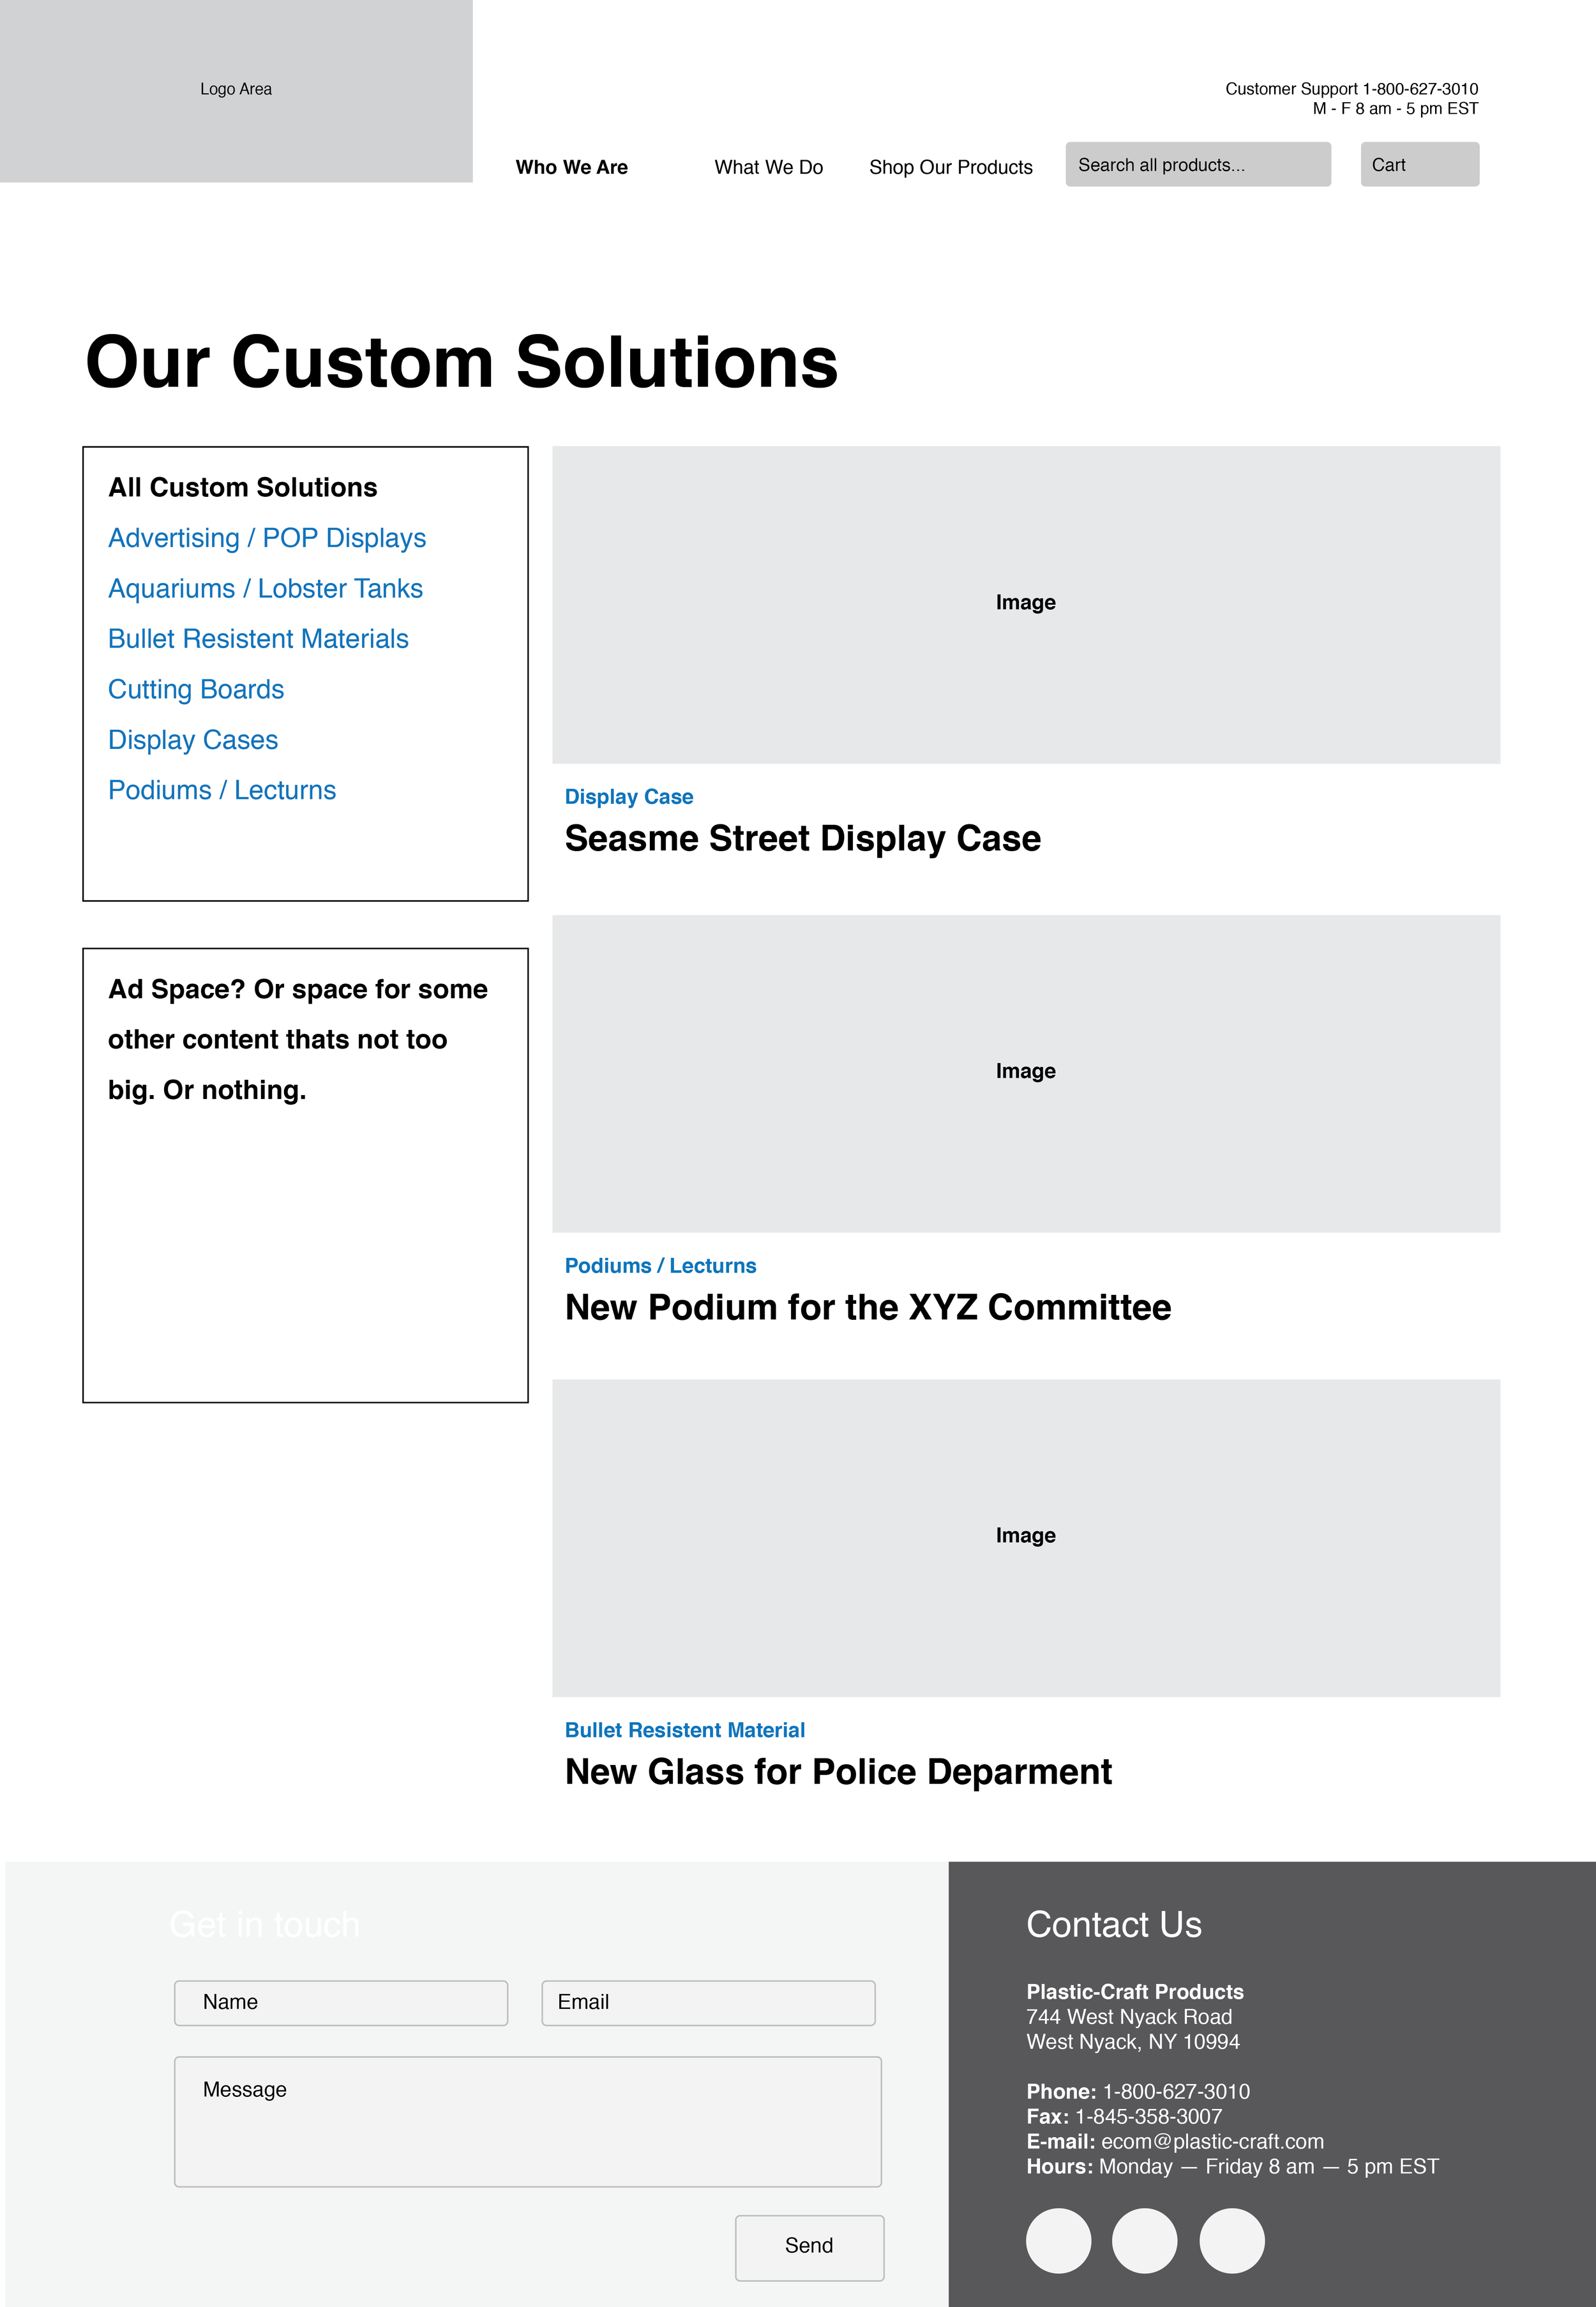 Plastic-Craft_CustomSolutions-07.png